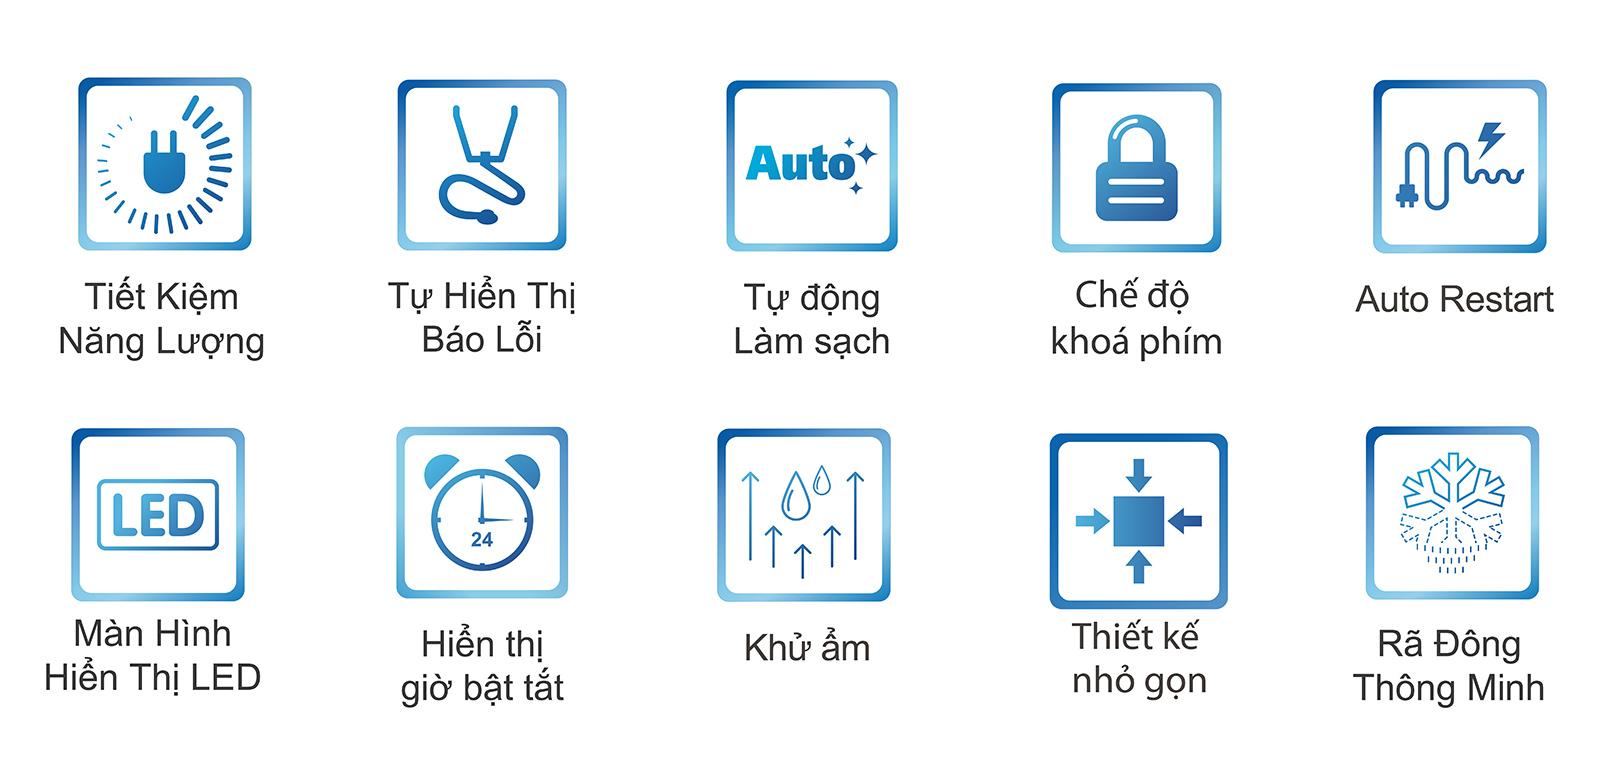 icy-tinh-nang-khac.jpg